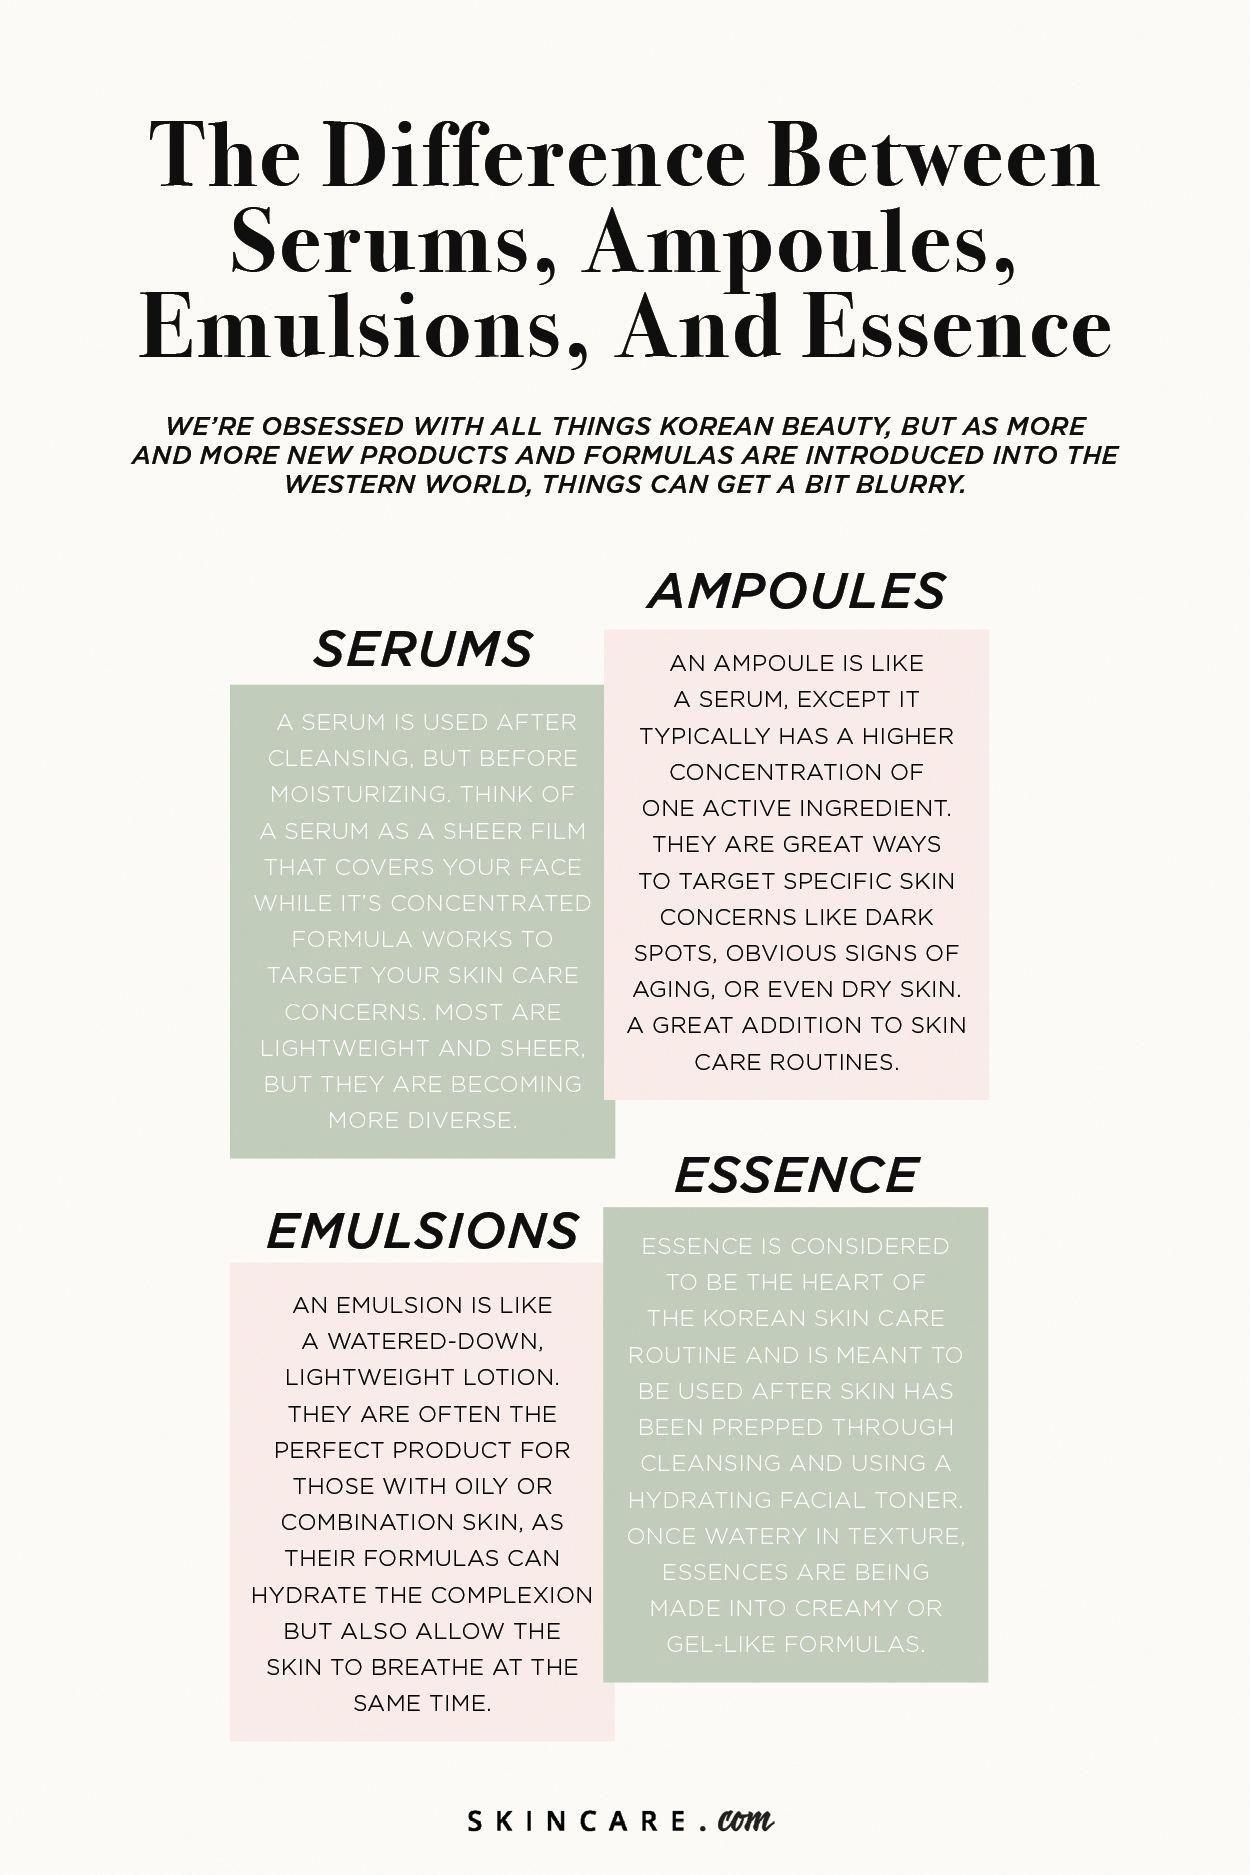 How To Use Serums Vs Essences Vs Emulsions Vs Ampoules Skincare Com By L Oreal Skin Care Regimen Skin Care Tips Skin Care